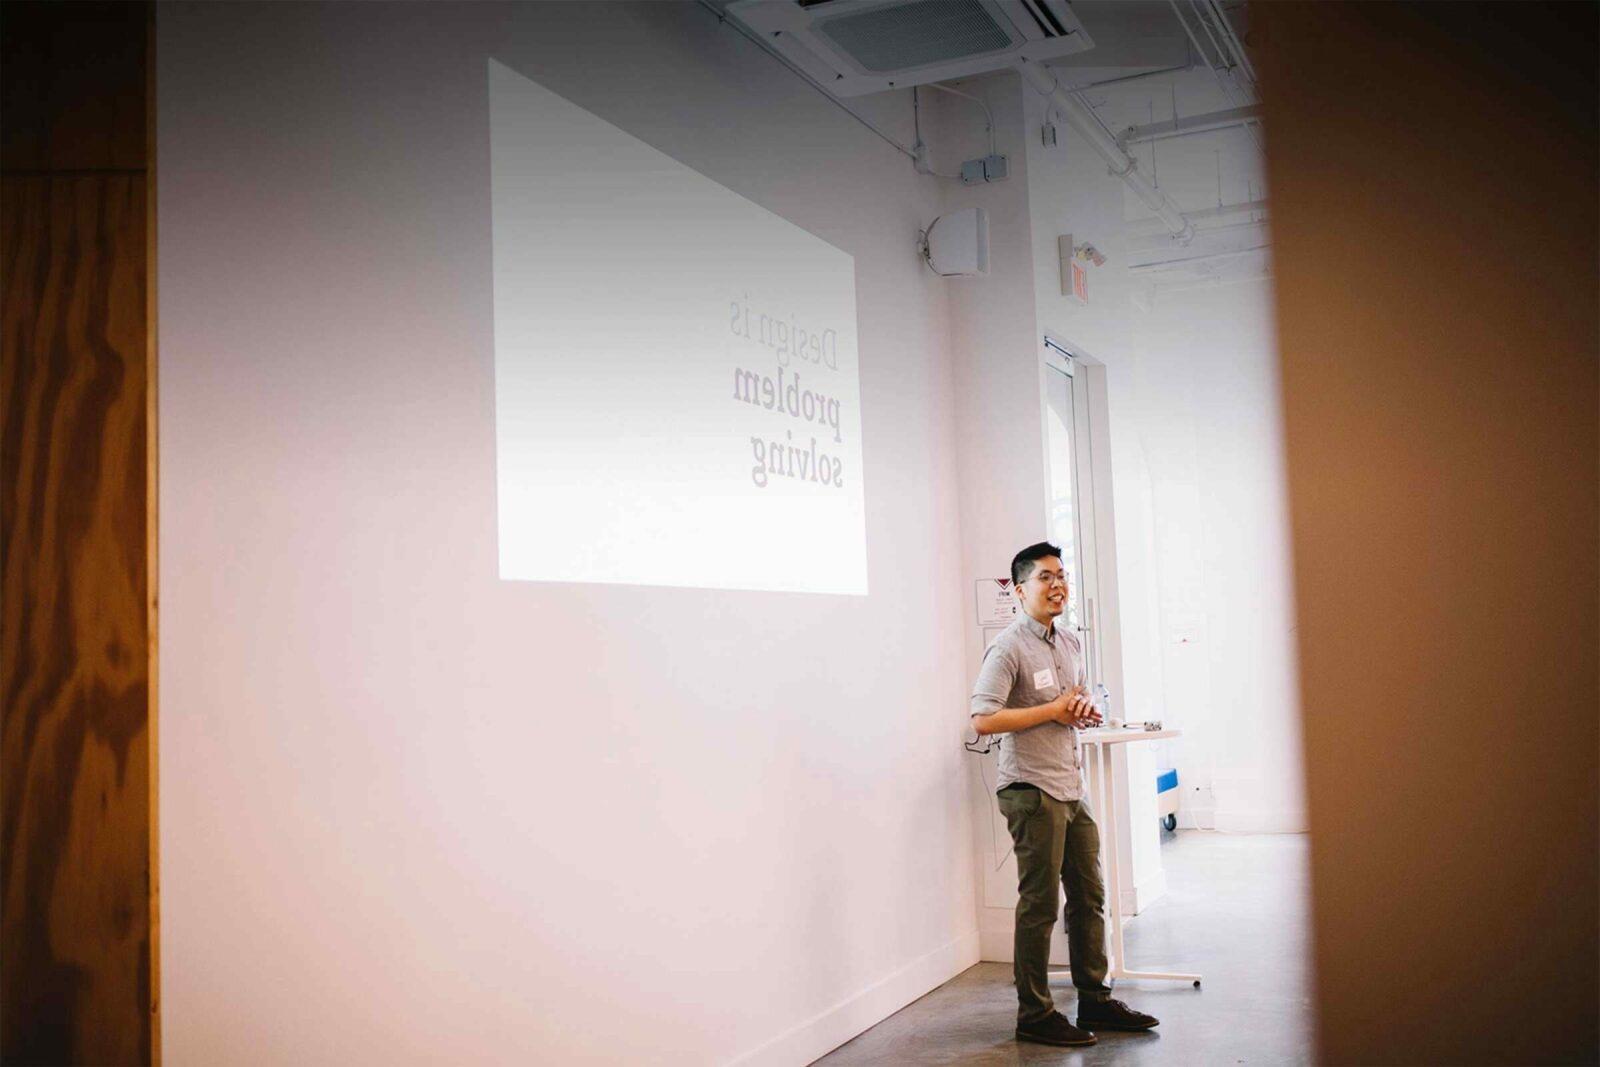 Stan presenting design thinking day